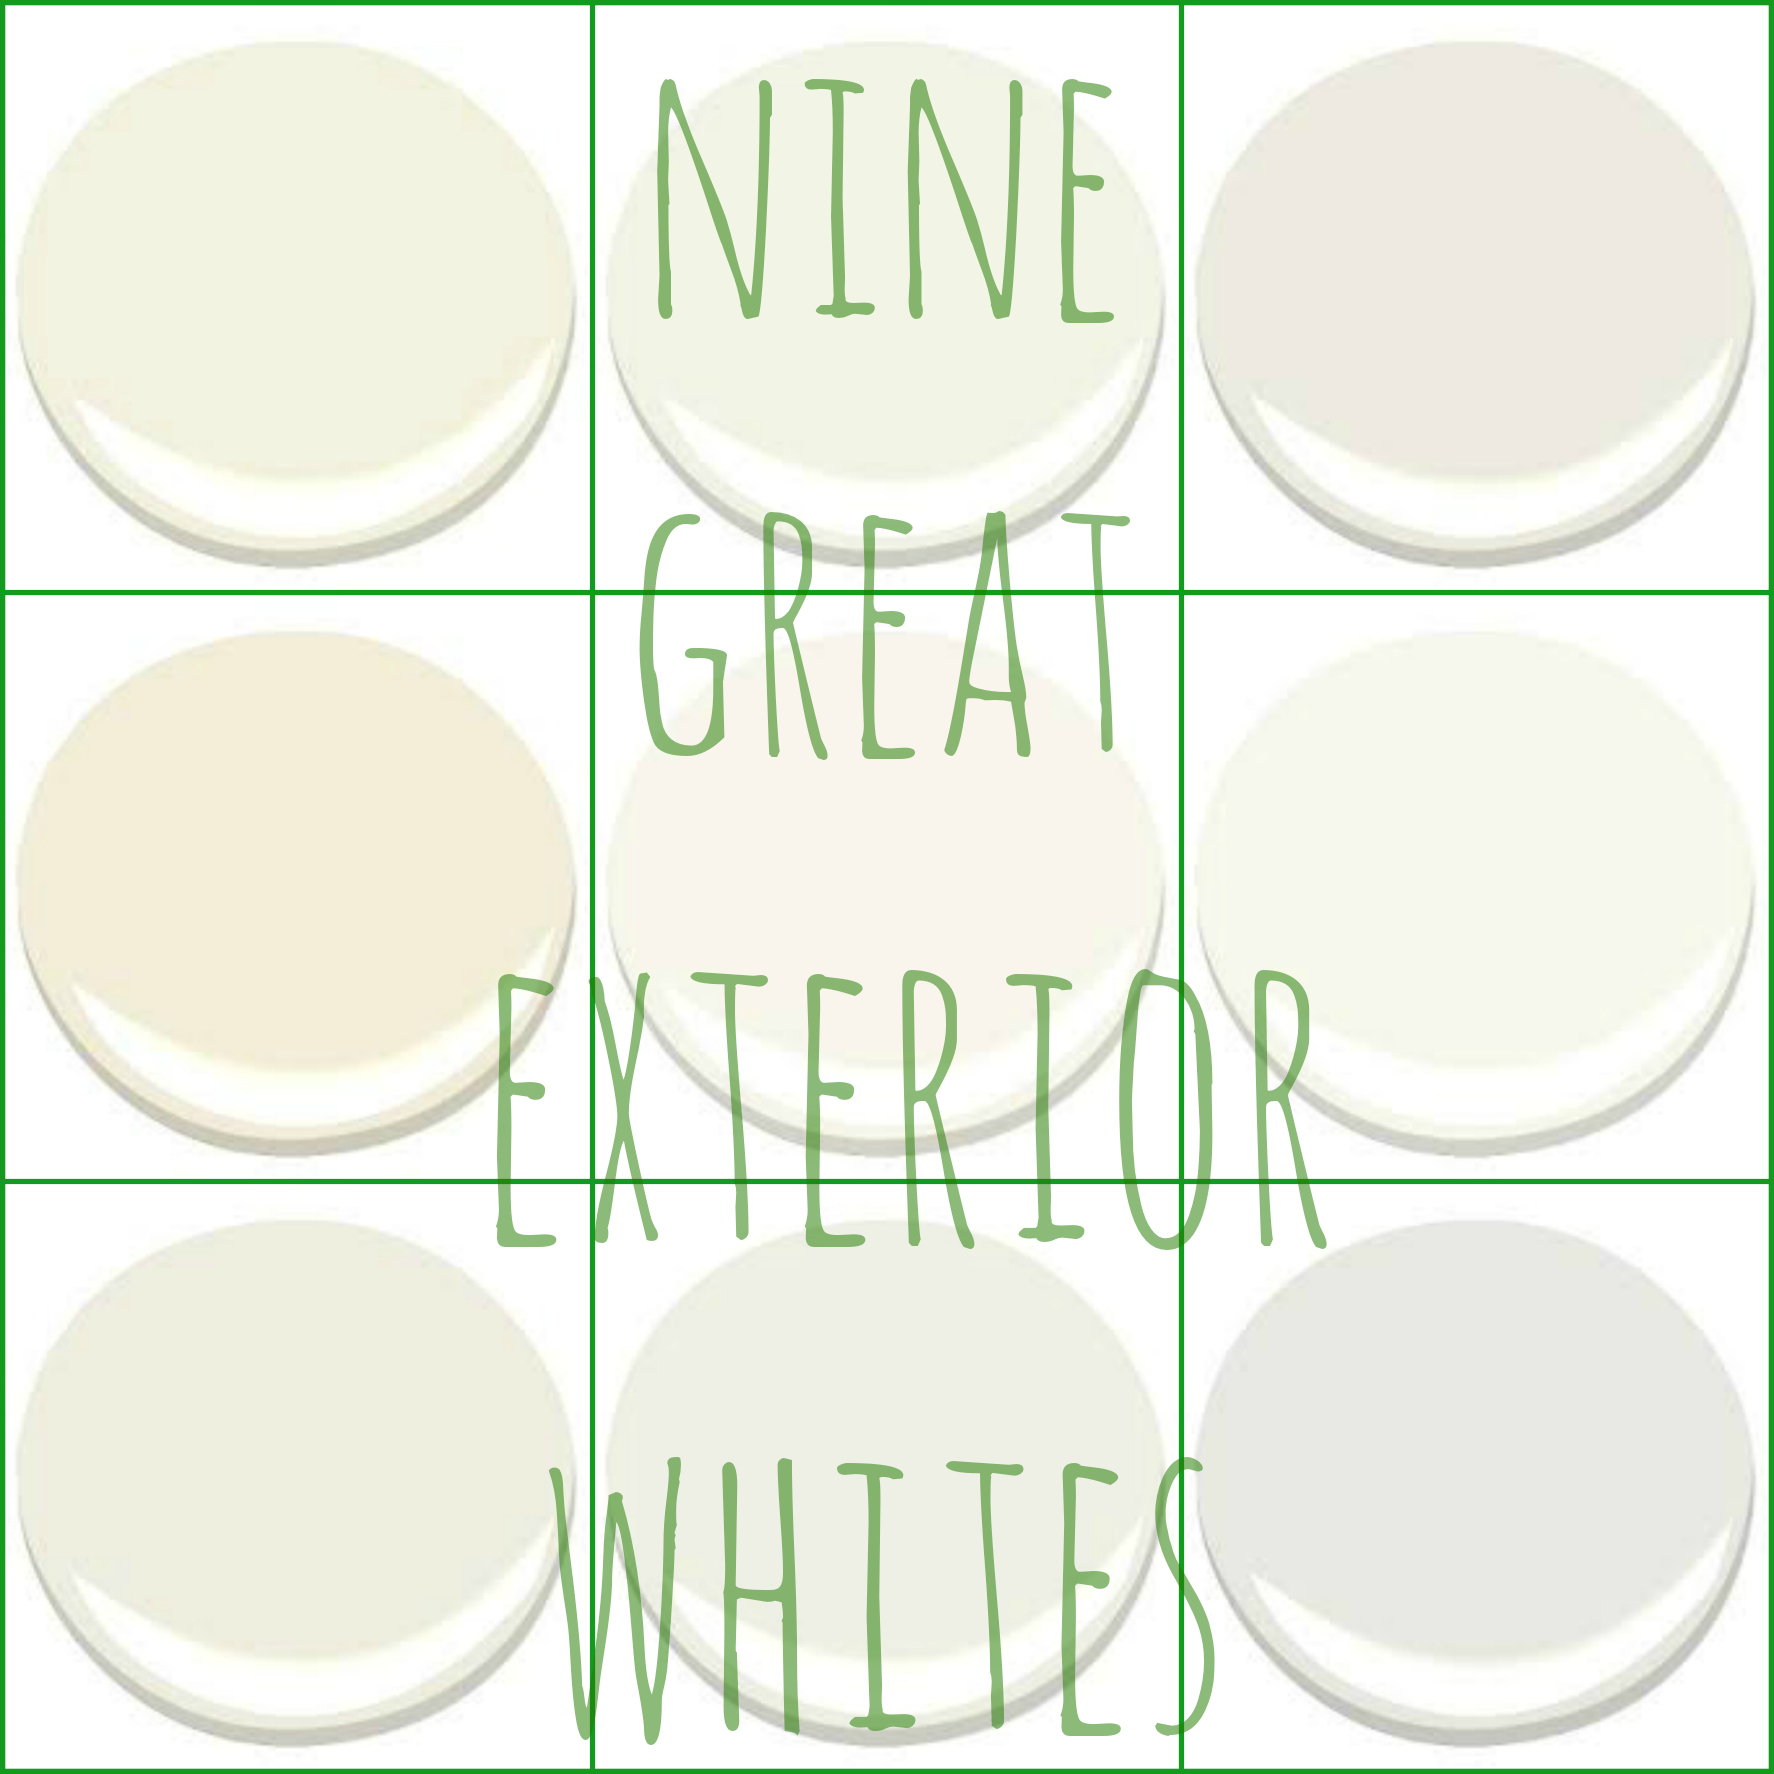 none great benjamin moore exterior whites acadia white cloud white glacier white linen white mountain peak white simply white swiss coffee - Benjamin Moore Creme Brulee